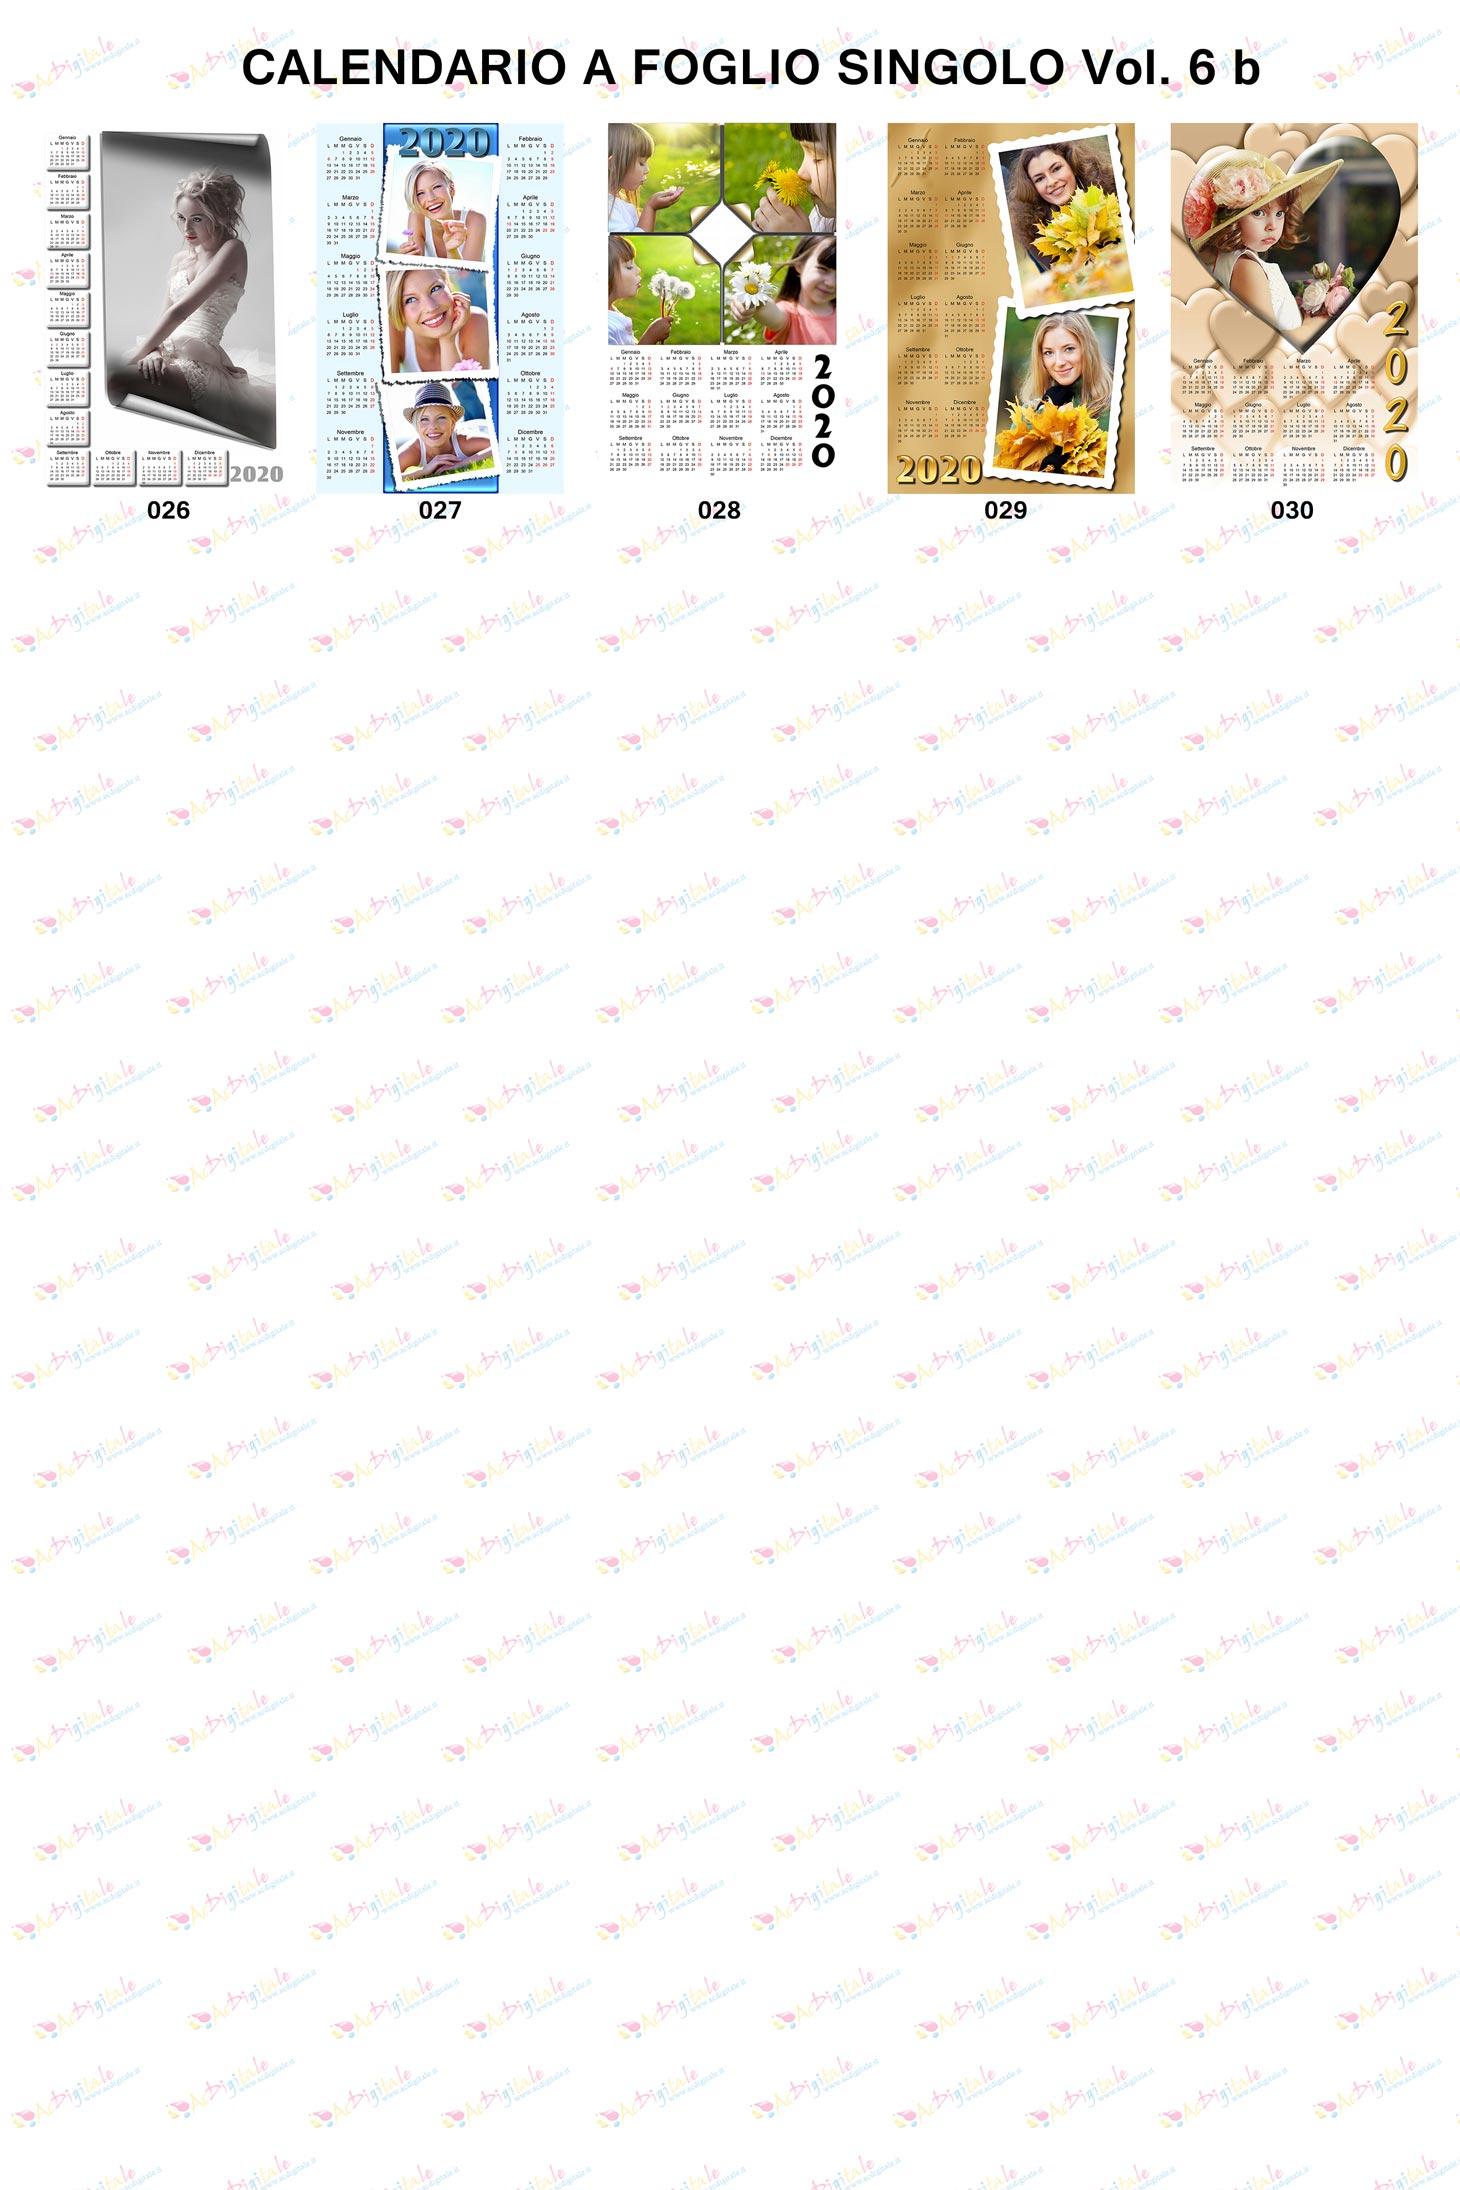 Anteprima calendari personalizzati 2020  volume 6b